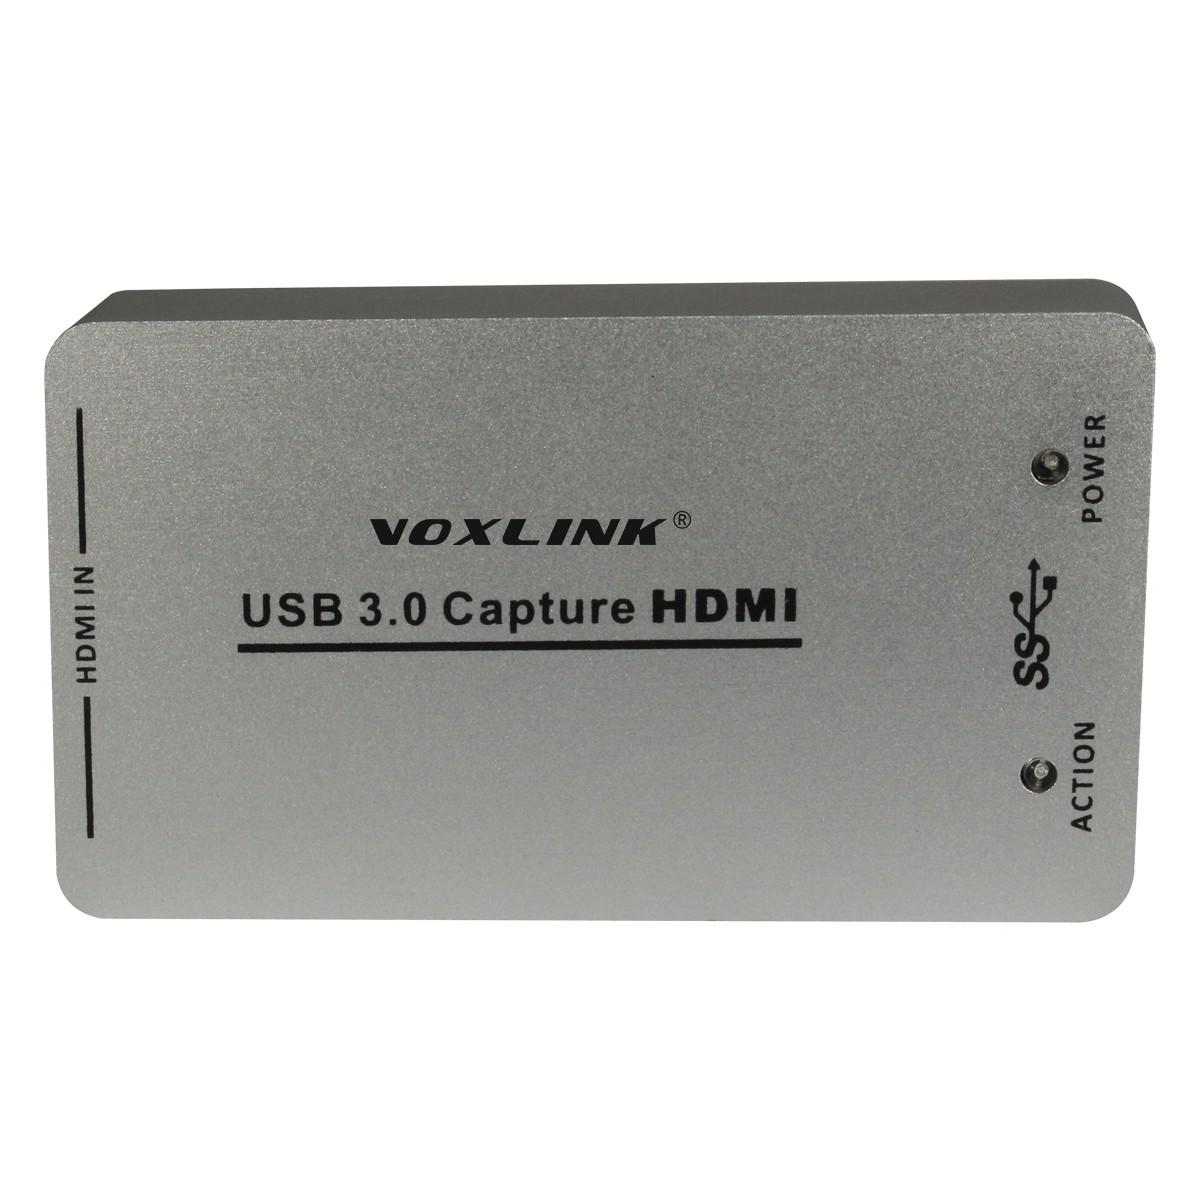 VOXLINK XI100D UVC USB3.0 1080P 60FPS HDMI Capture Dongle/USB2.0 HDMI Video Capture Card for Xbox PS3 PS4 Windows 7 Linux